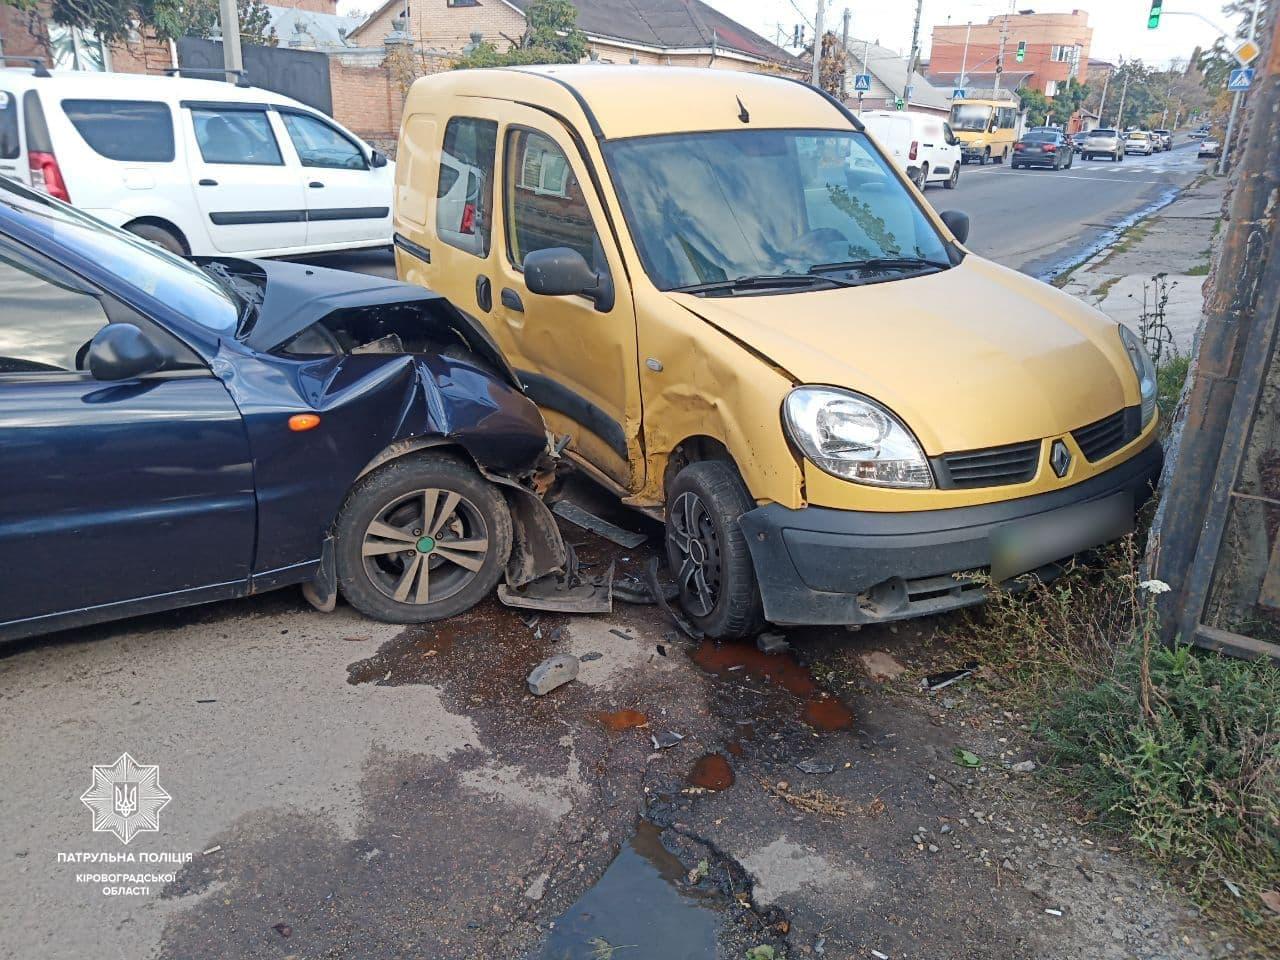 На вулицi Кропивницького зiткнулися Renault та ЗАЗ-Daewoo (ФОТО)